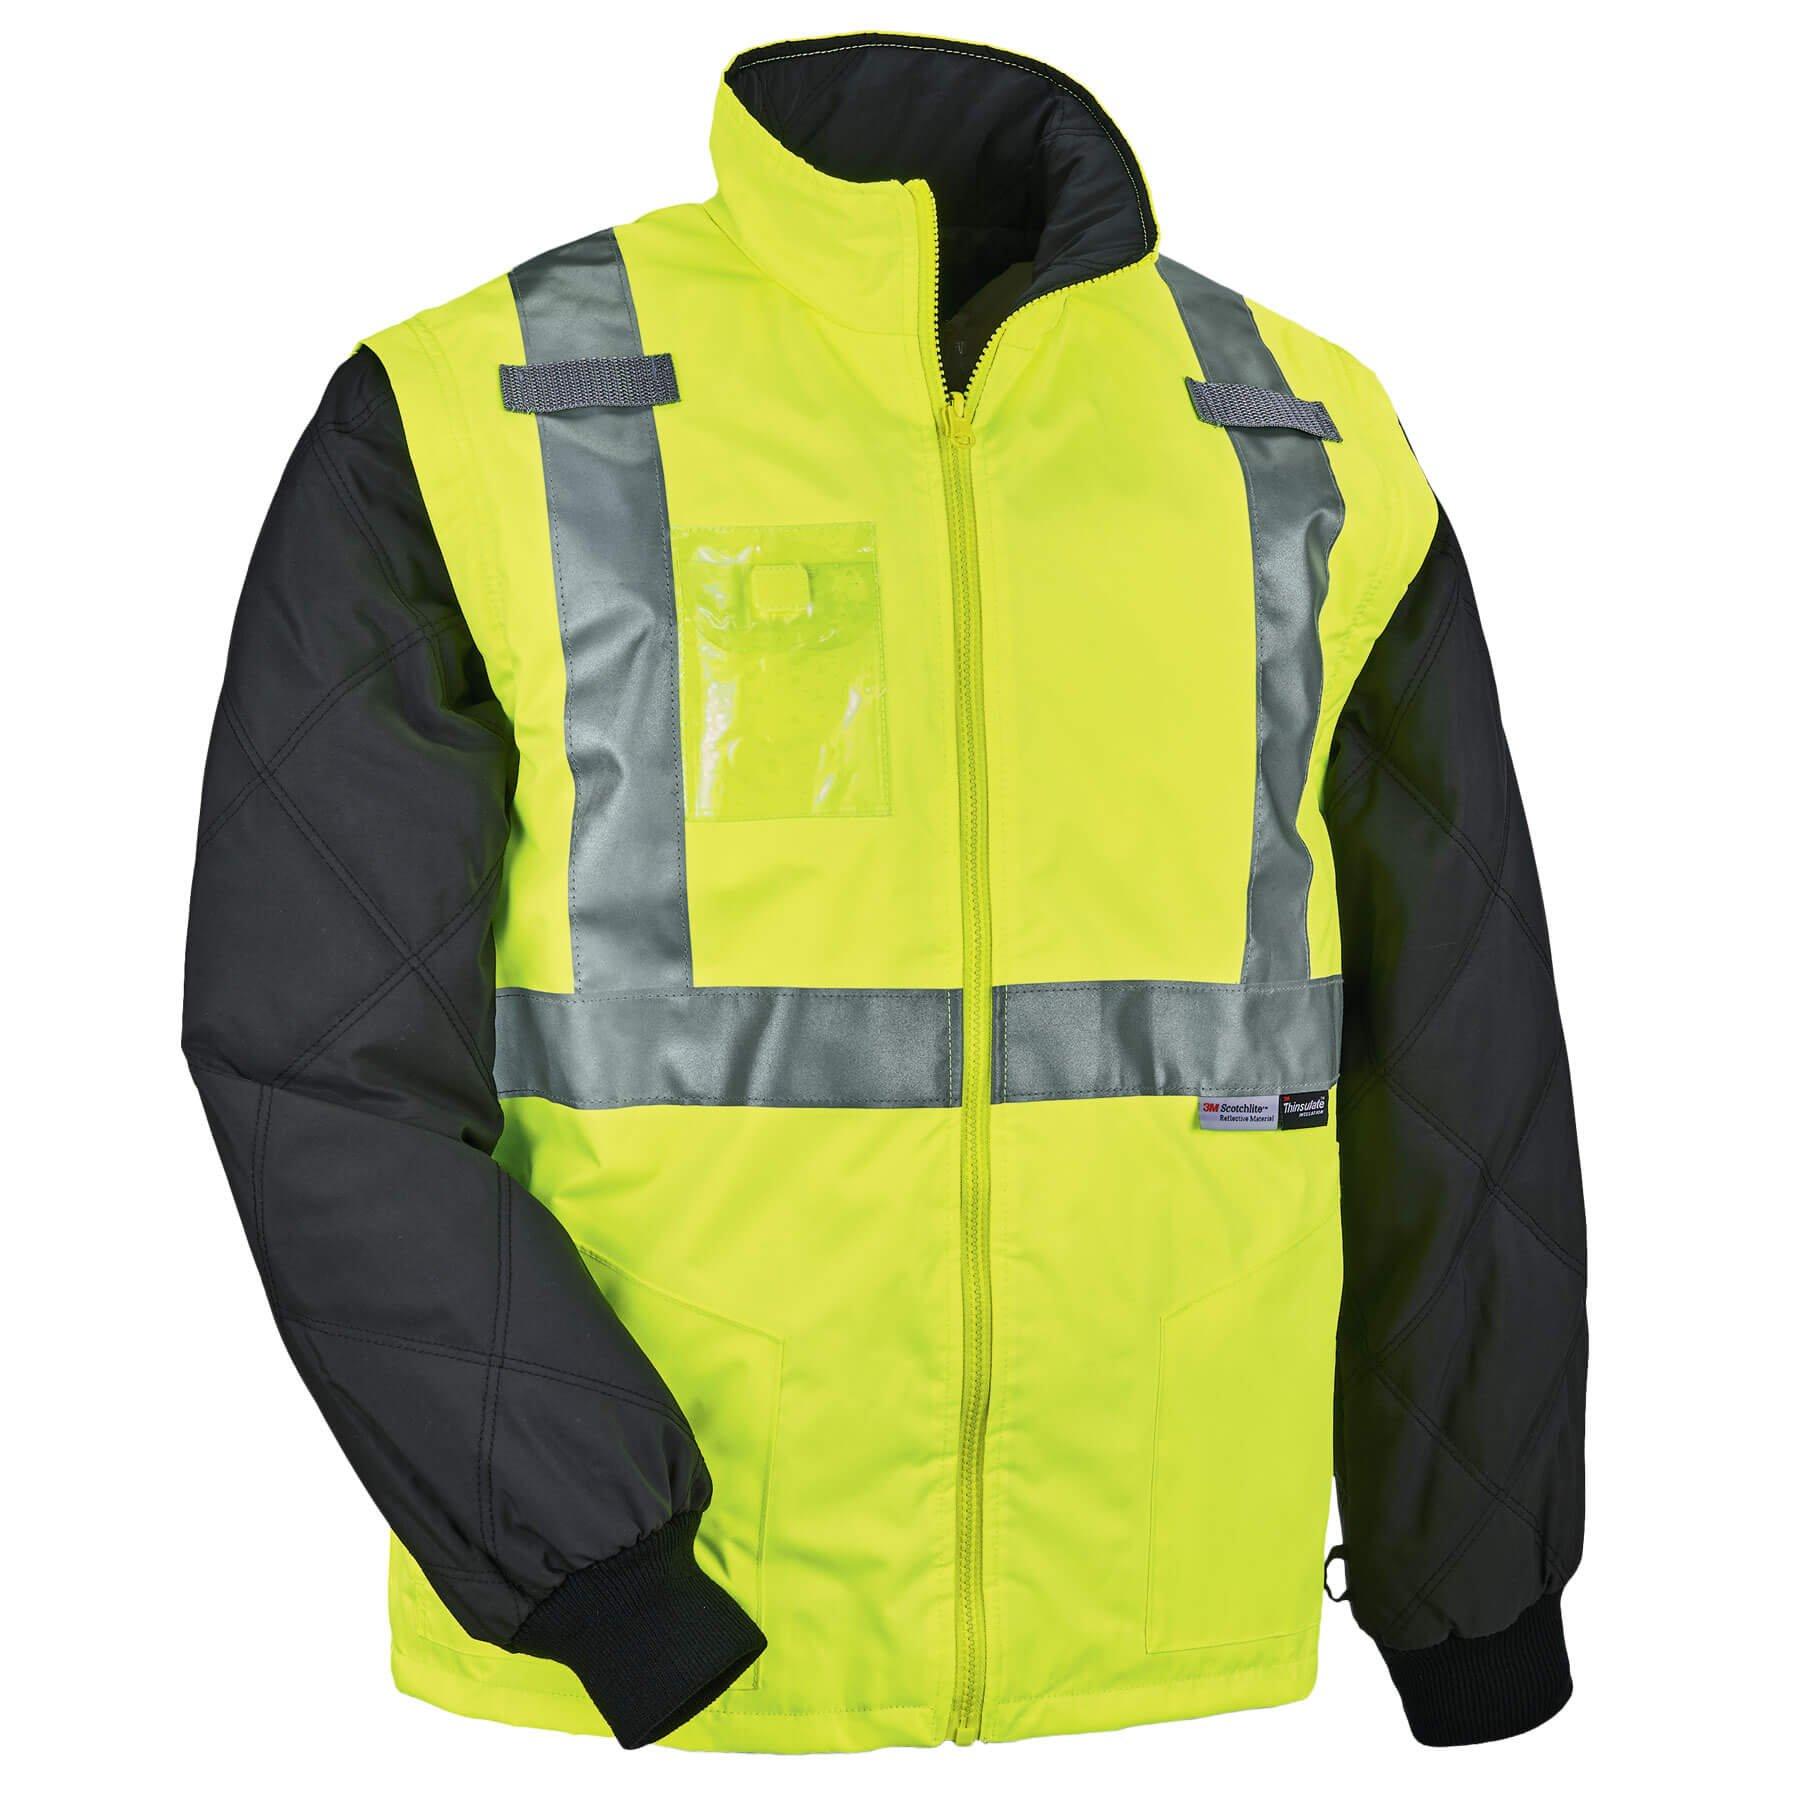 Ergodyne GloWear 8287 High Visibility Reflective Convertible Thermal Vest/Jacket, X-Large, Lime